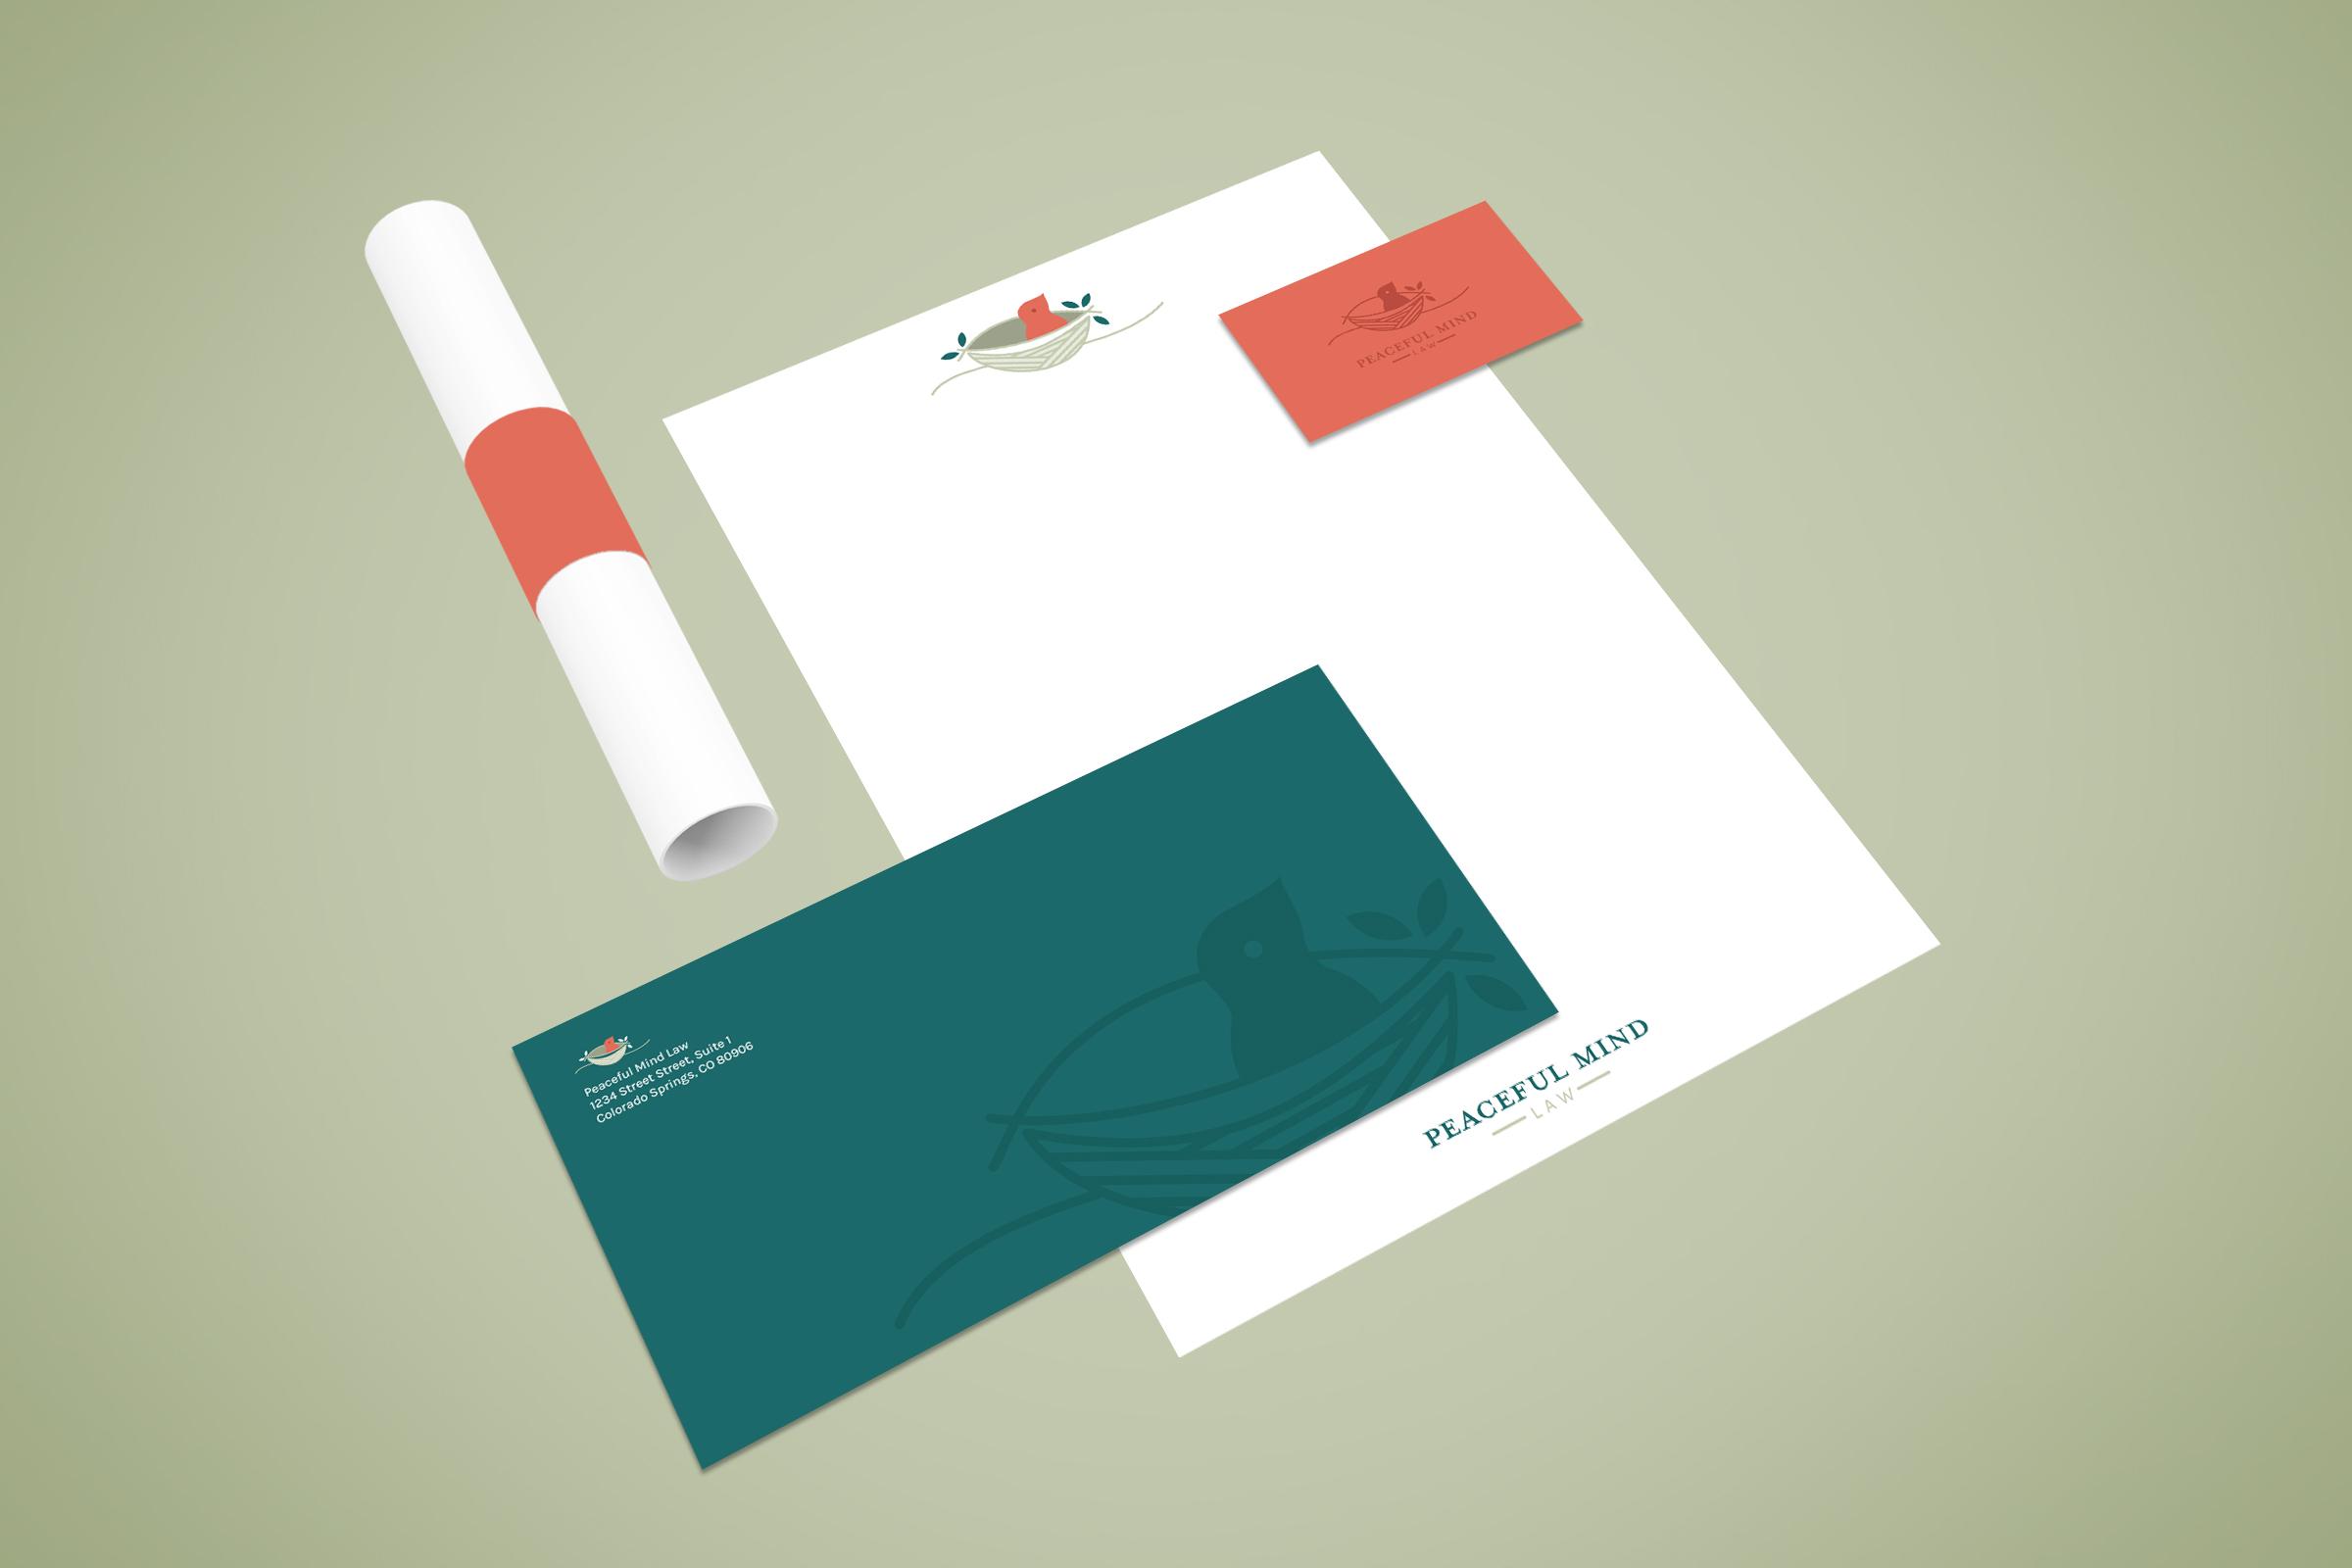 hearthfire-creative-logo-brand-identity-designer-denver-colorado-peaceful-mind-law-2.jpg